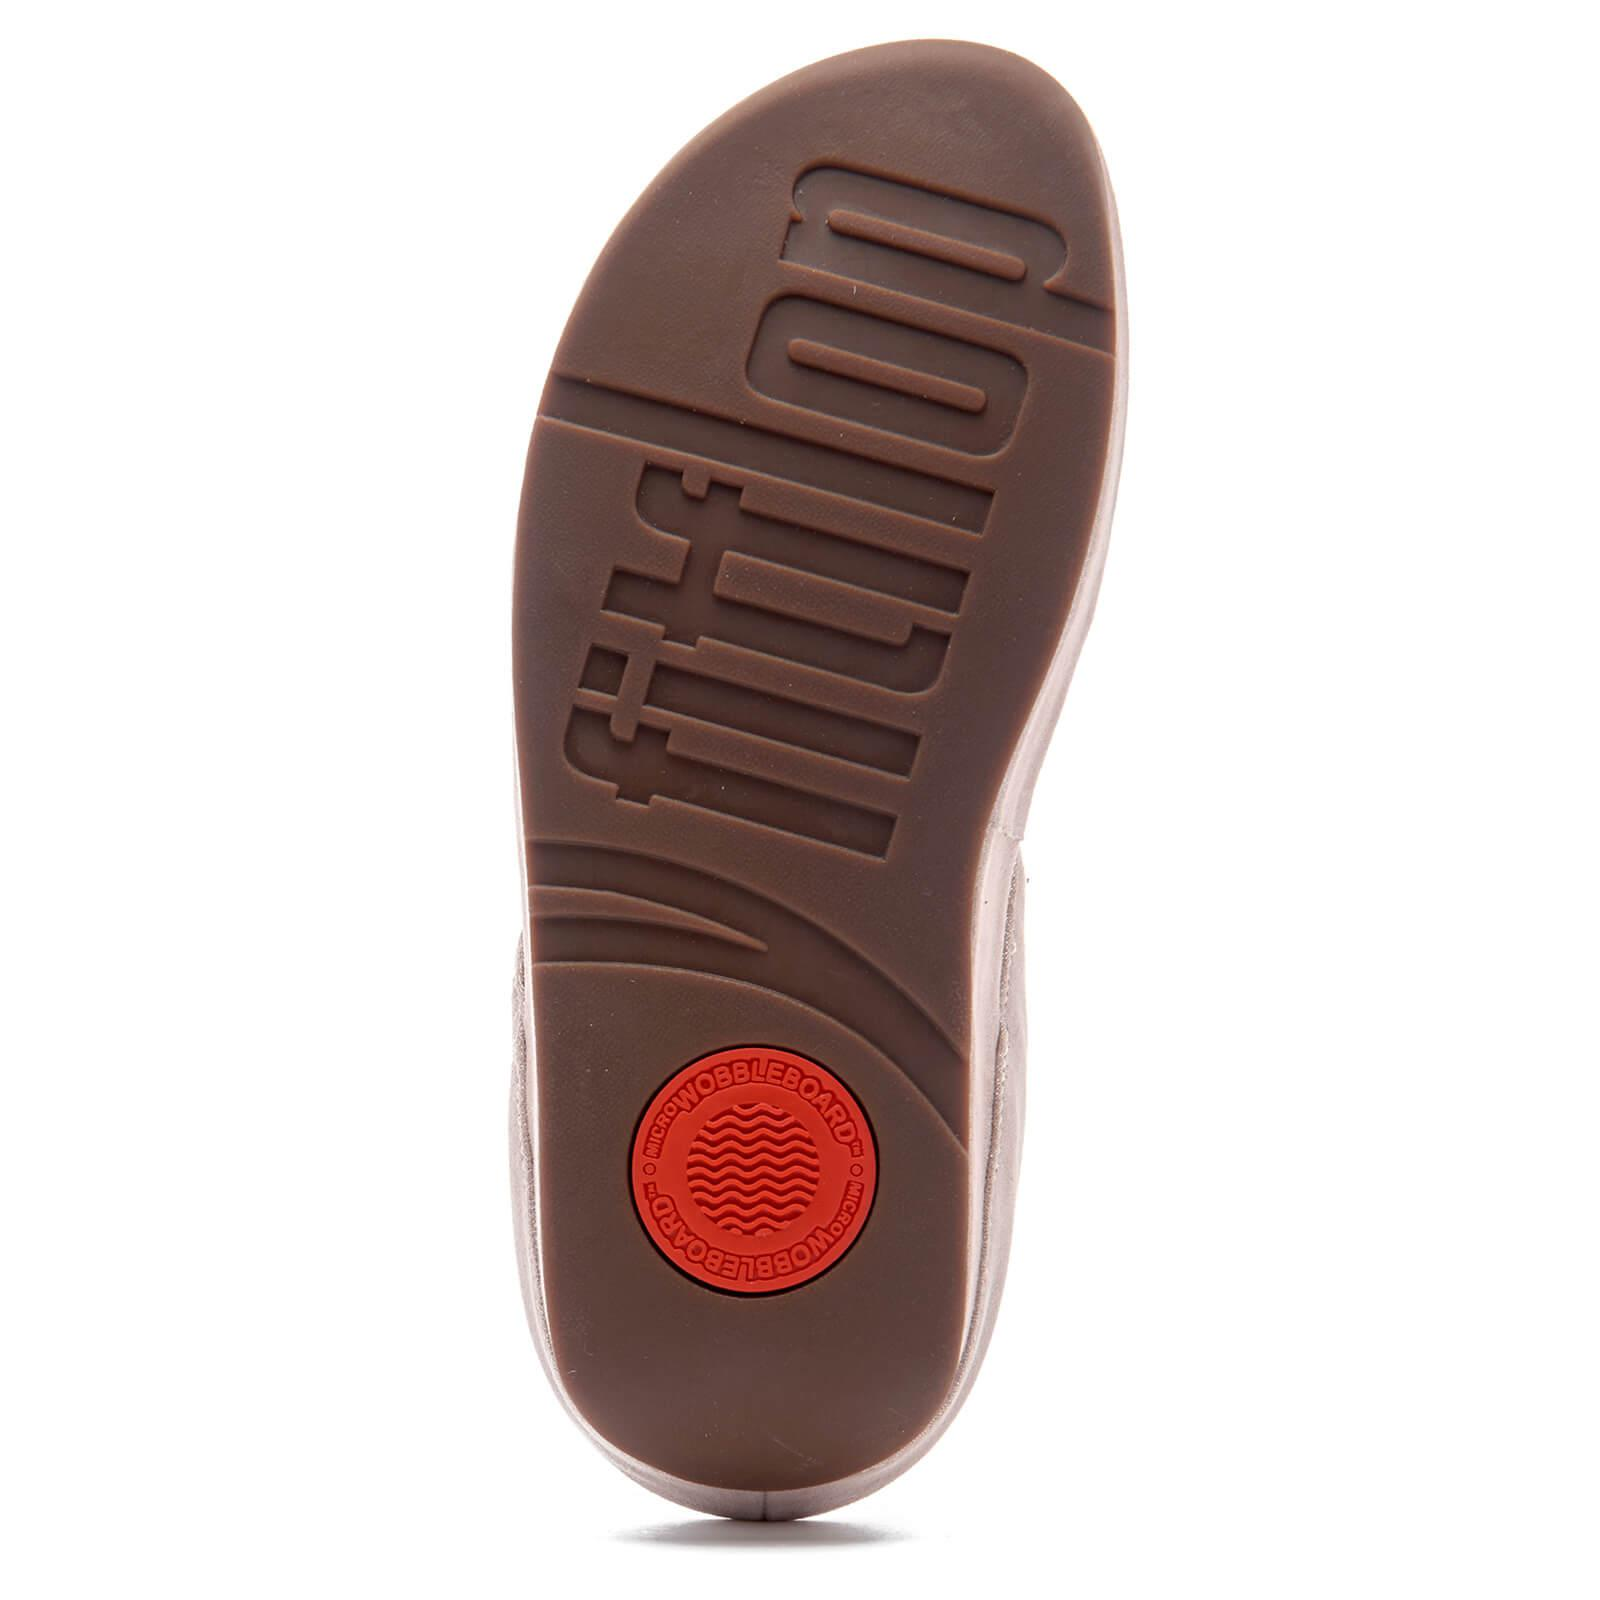 9a48da63f Lyst - Fitflop Cha Cha Leather/suede Tassel Toe-post Sandals in Metallic